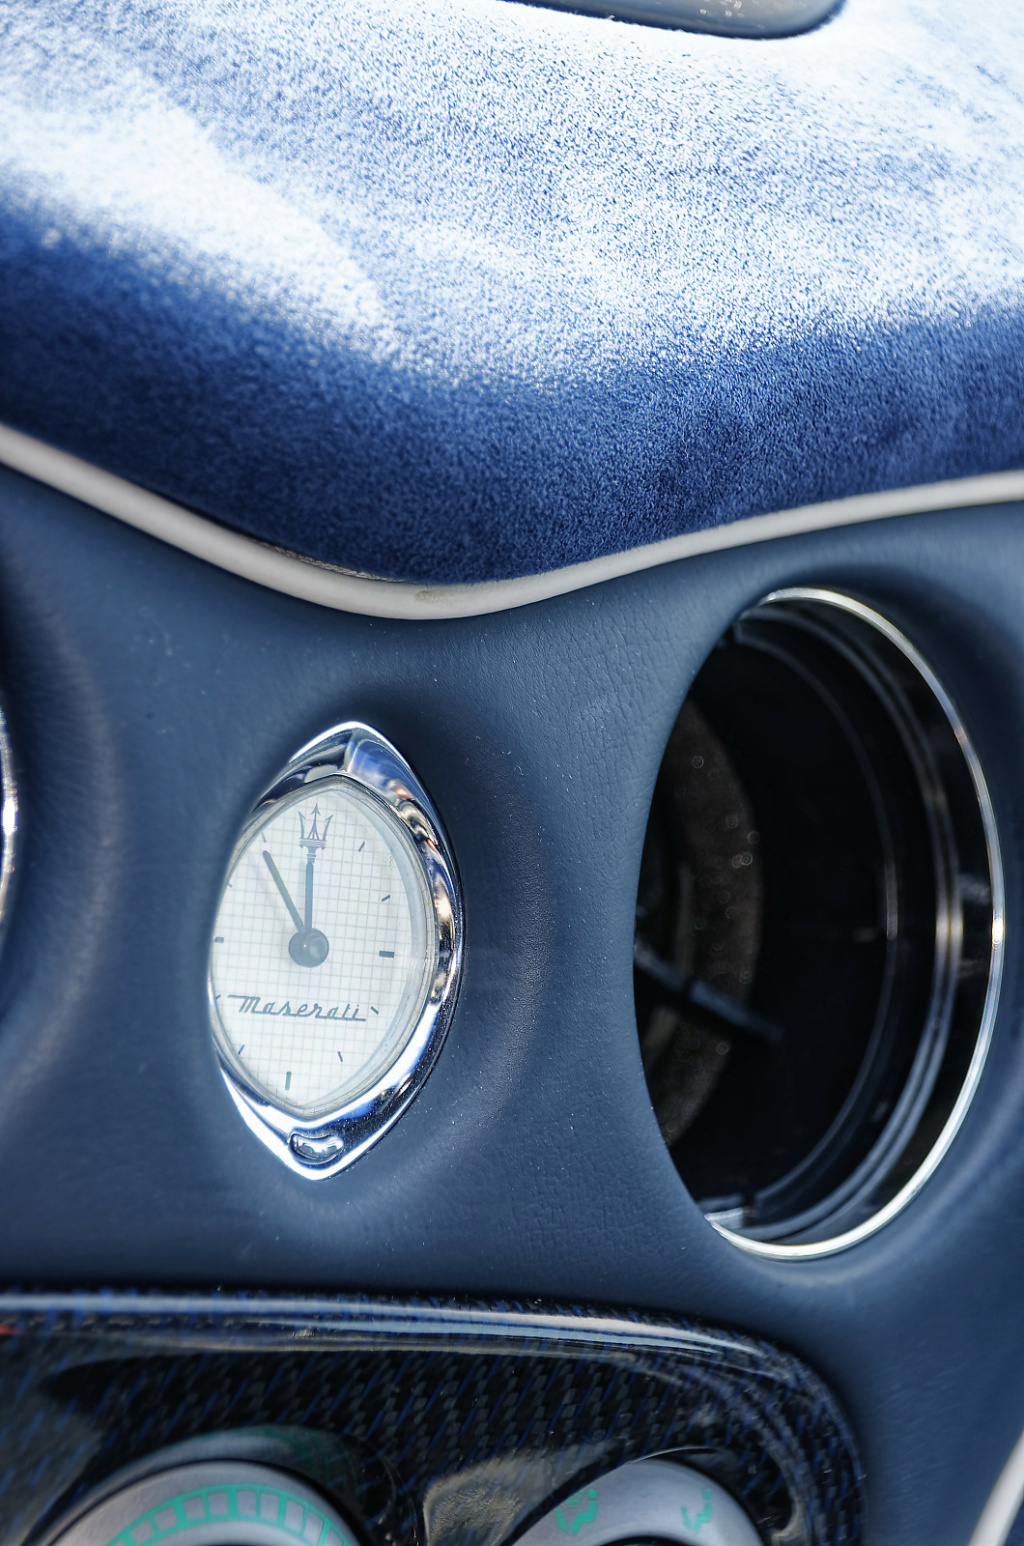 [Charpot3200] GranSport 10th Anniversary Bianco Eldorado, Blu Navy _dsc0425